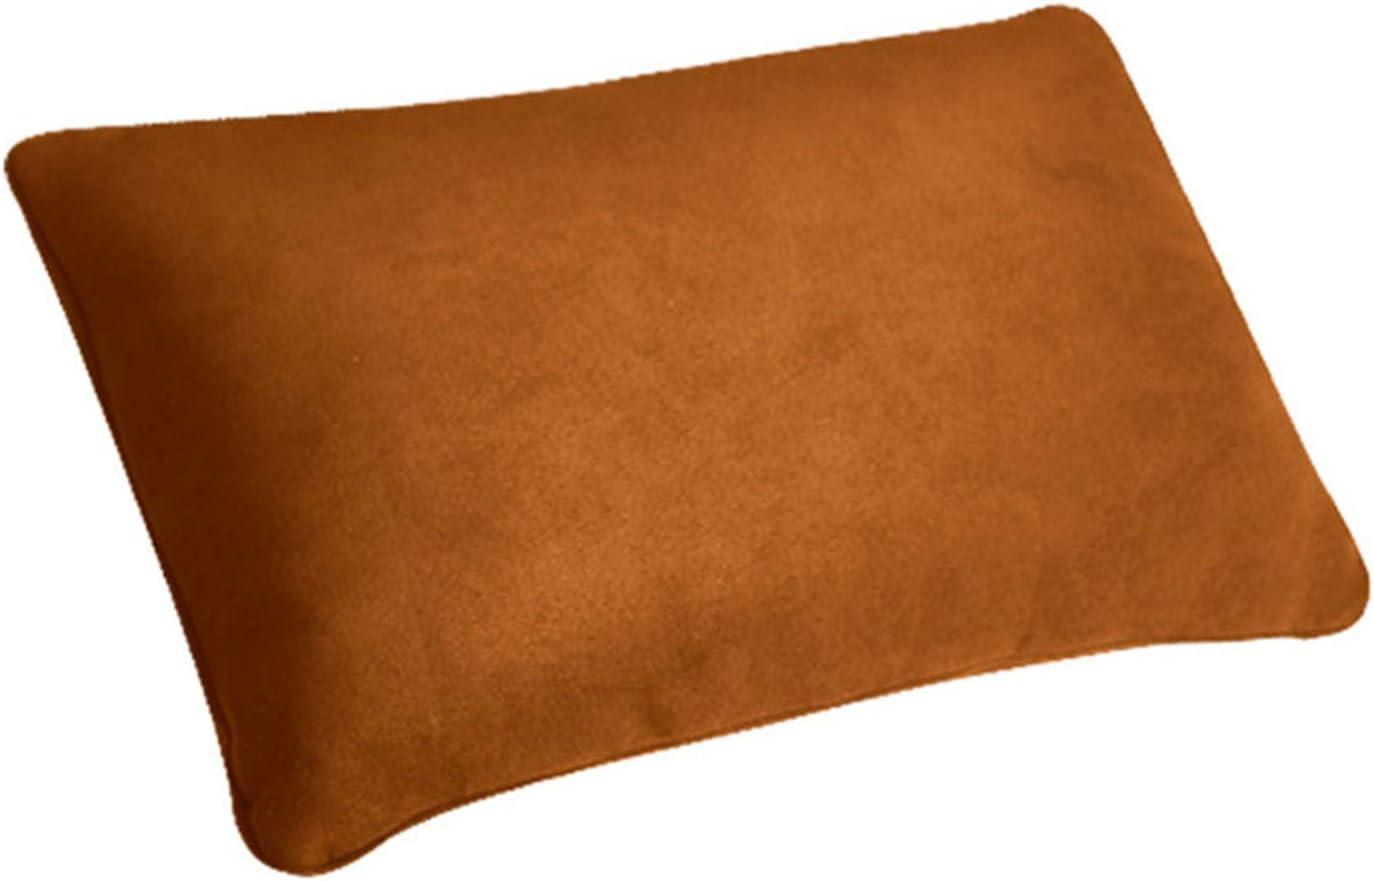 Meoliny Car Neck Pillow Soft Foam Ergonomic Super beauty product restock quality top Soldering Washable Adj Overlay